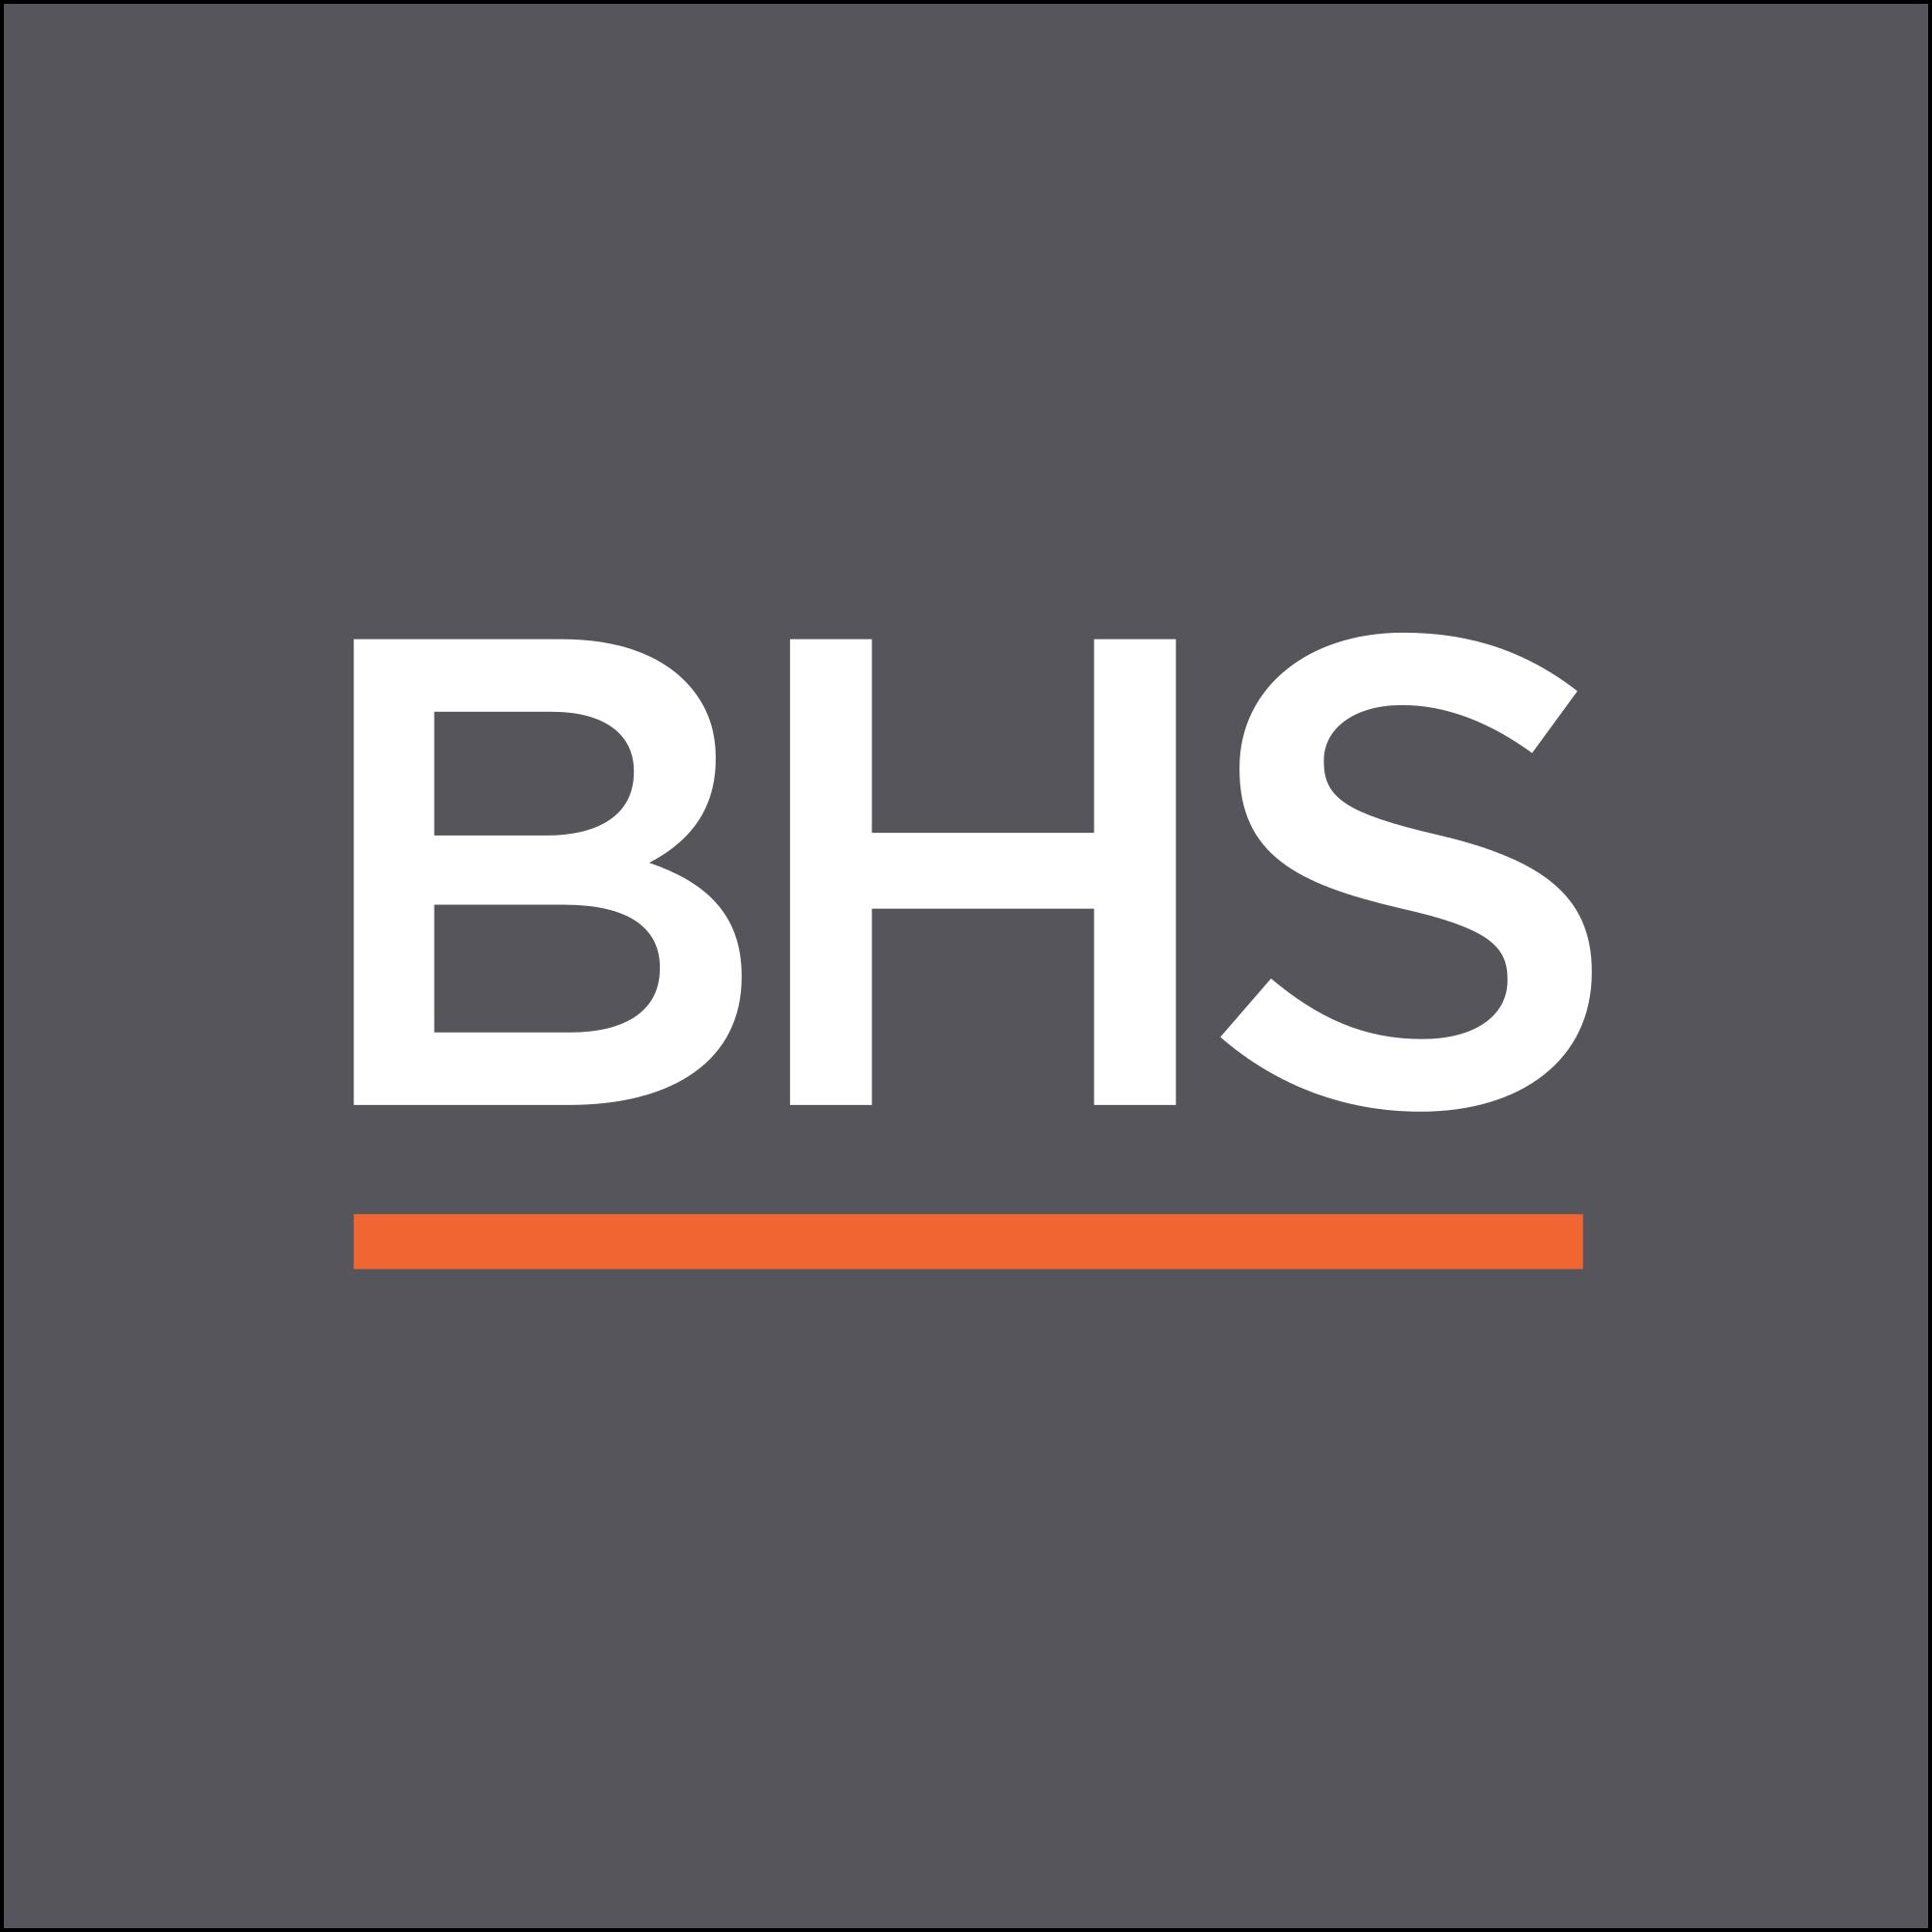 BHS job losses